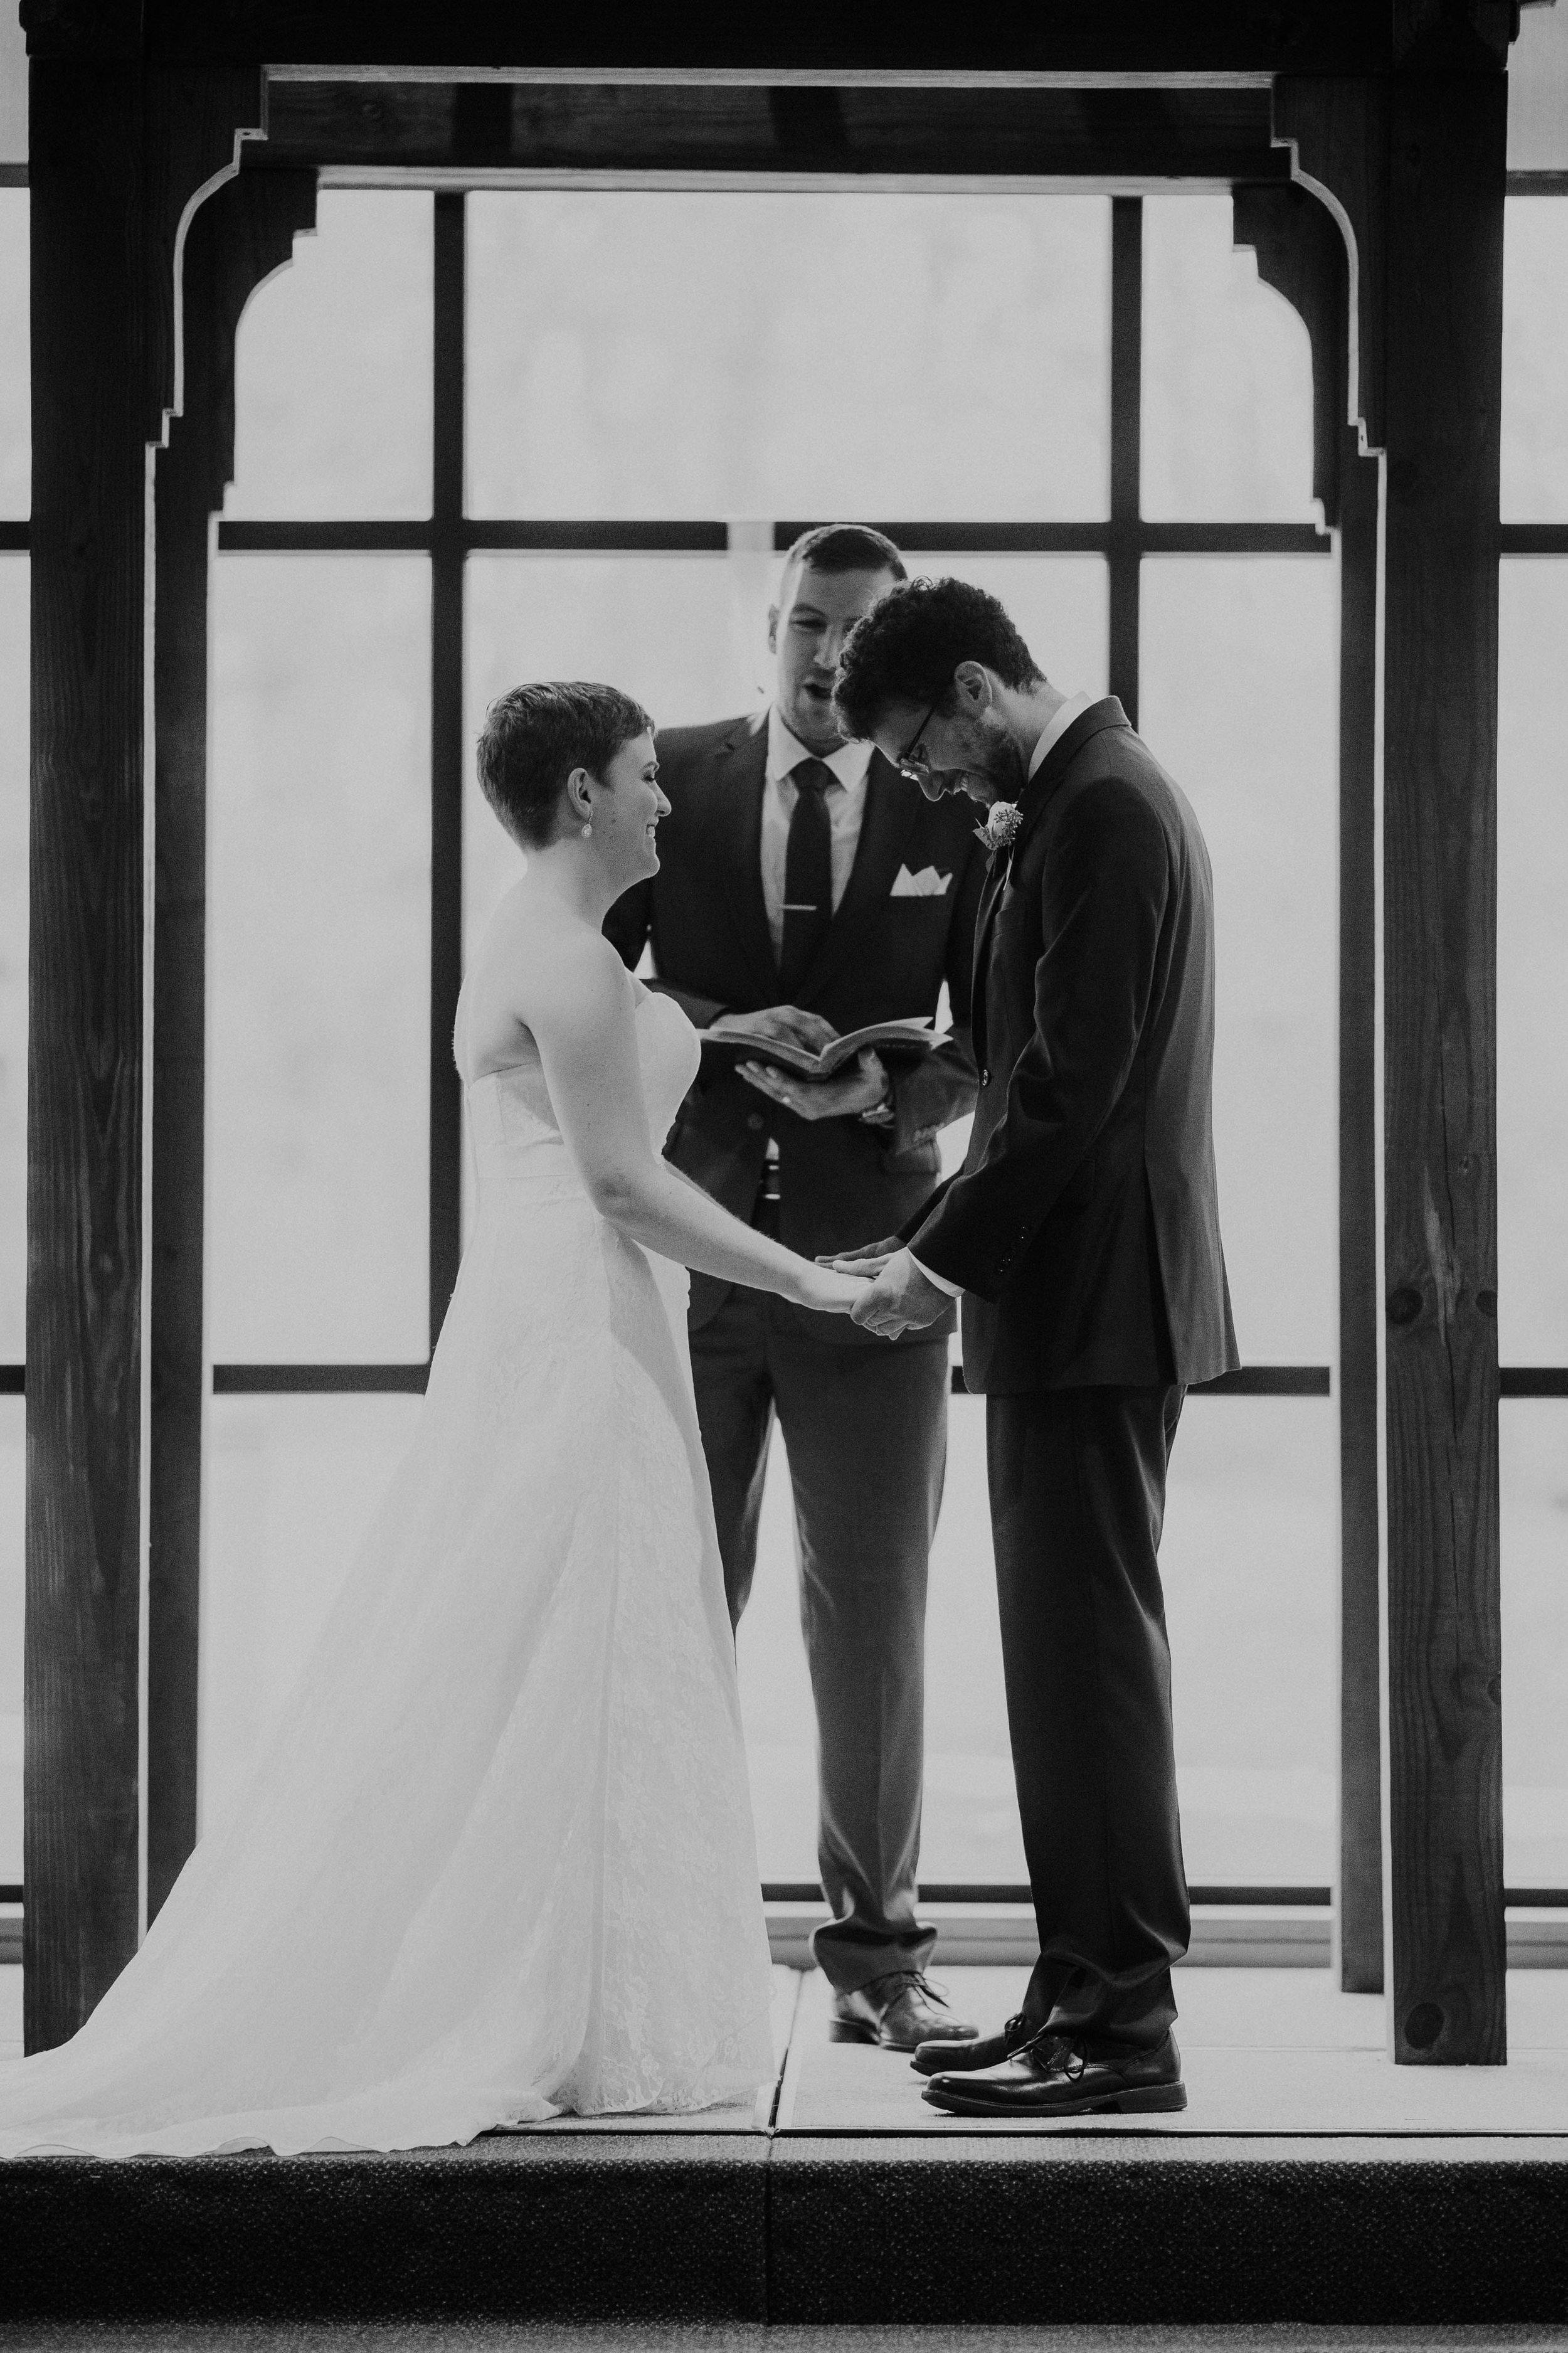 Columbus ohio wedding photographer grace e jones photography real fun joyful wedding86.jpg